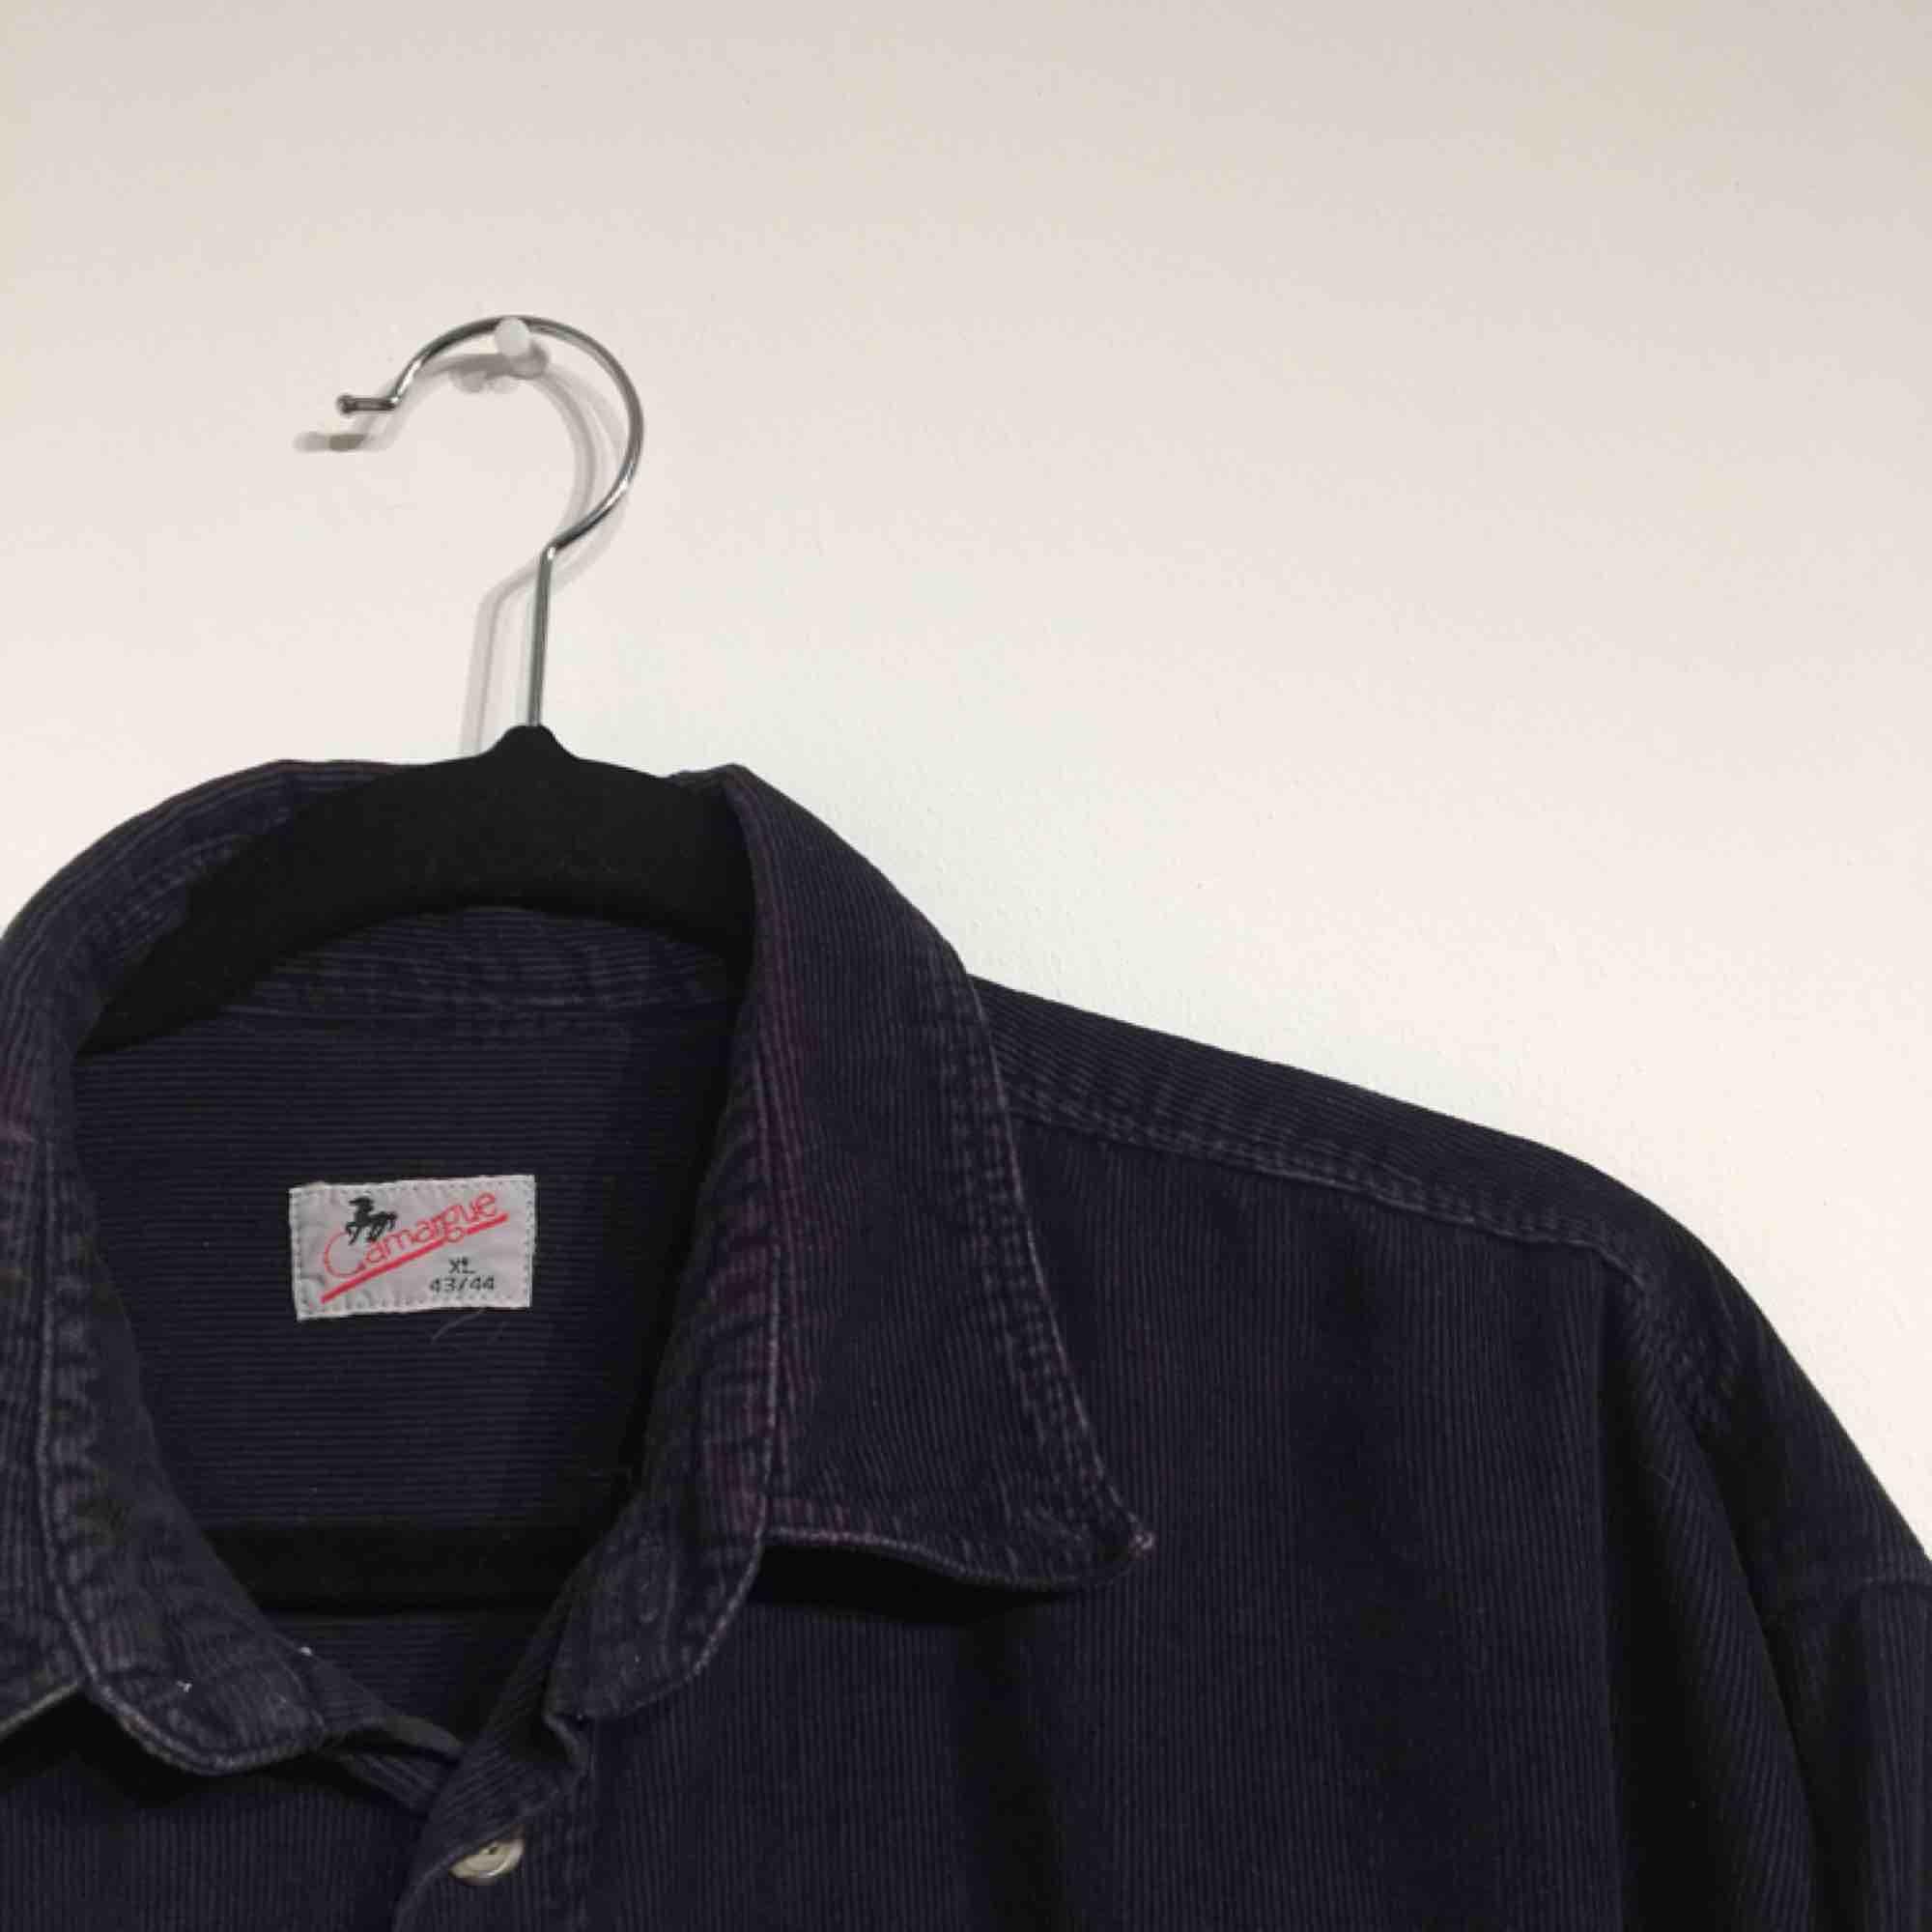 En mörkblå Manchester skjorta. Med frakt 250kr. Skjortor.